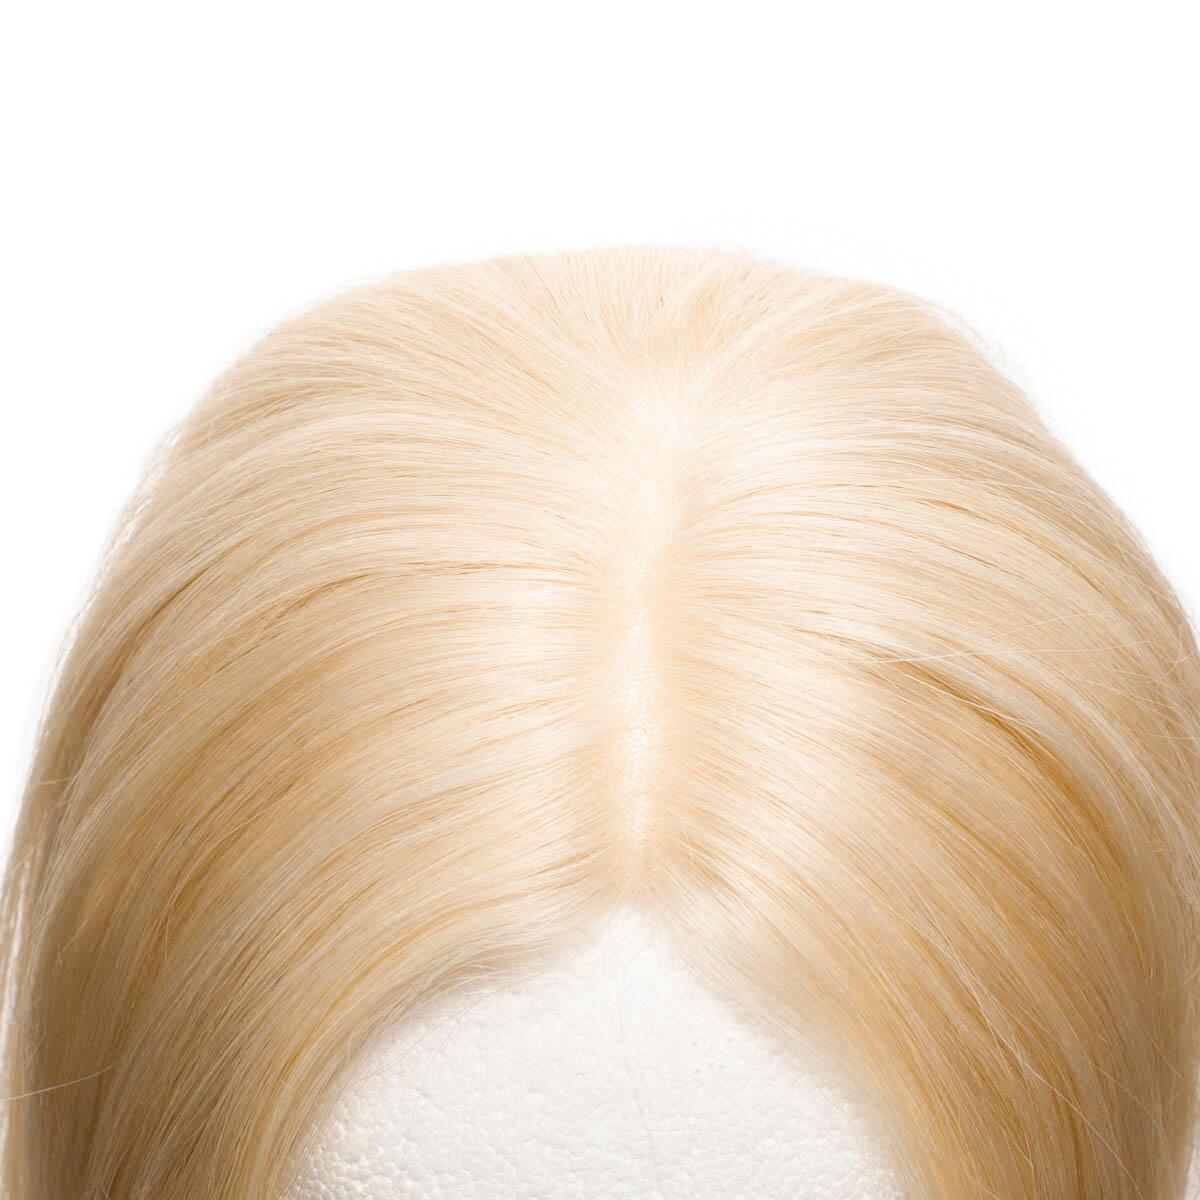 Top Piece Original Glatt 8.0 Light Golden Blonde 30 cm